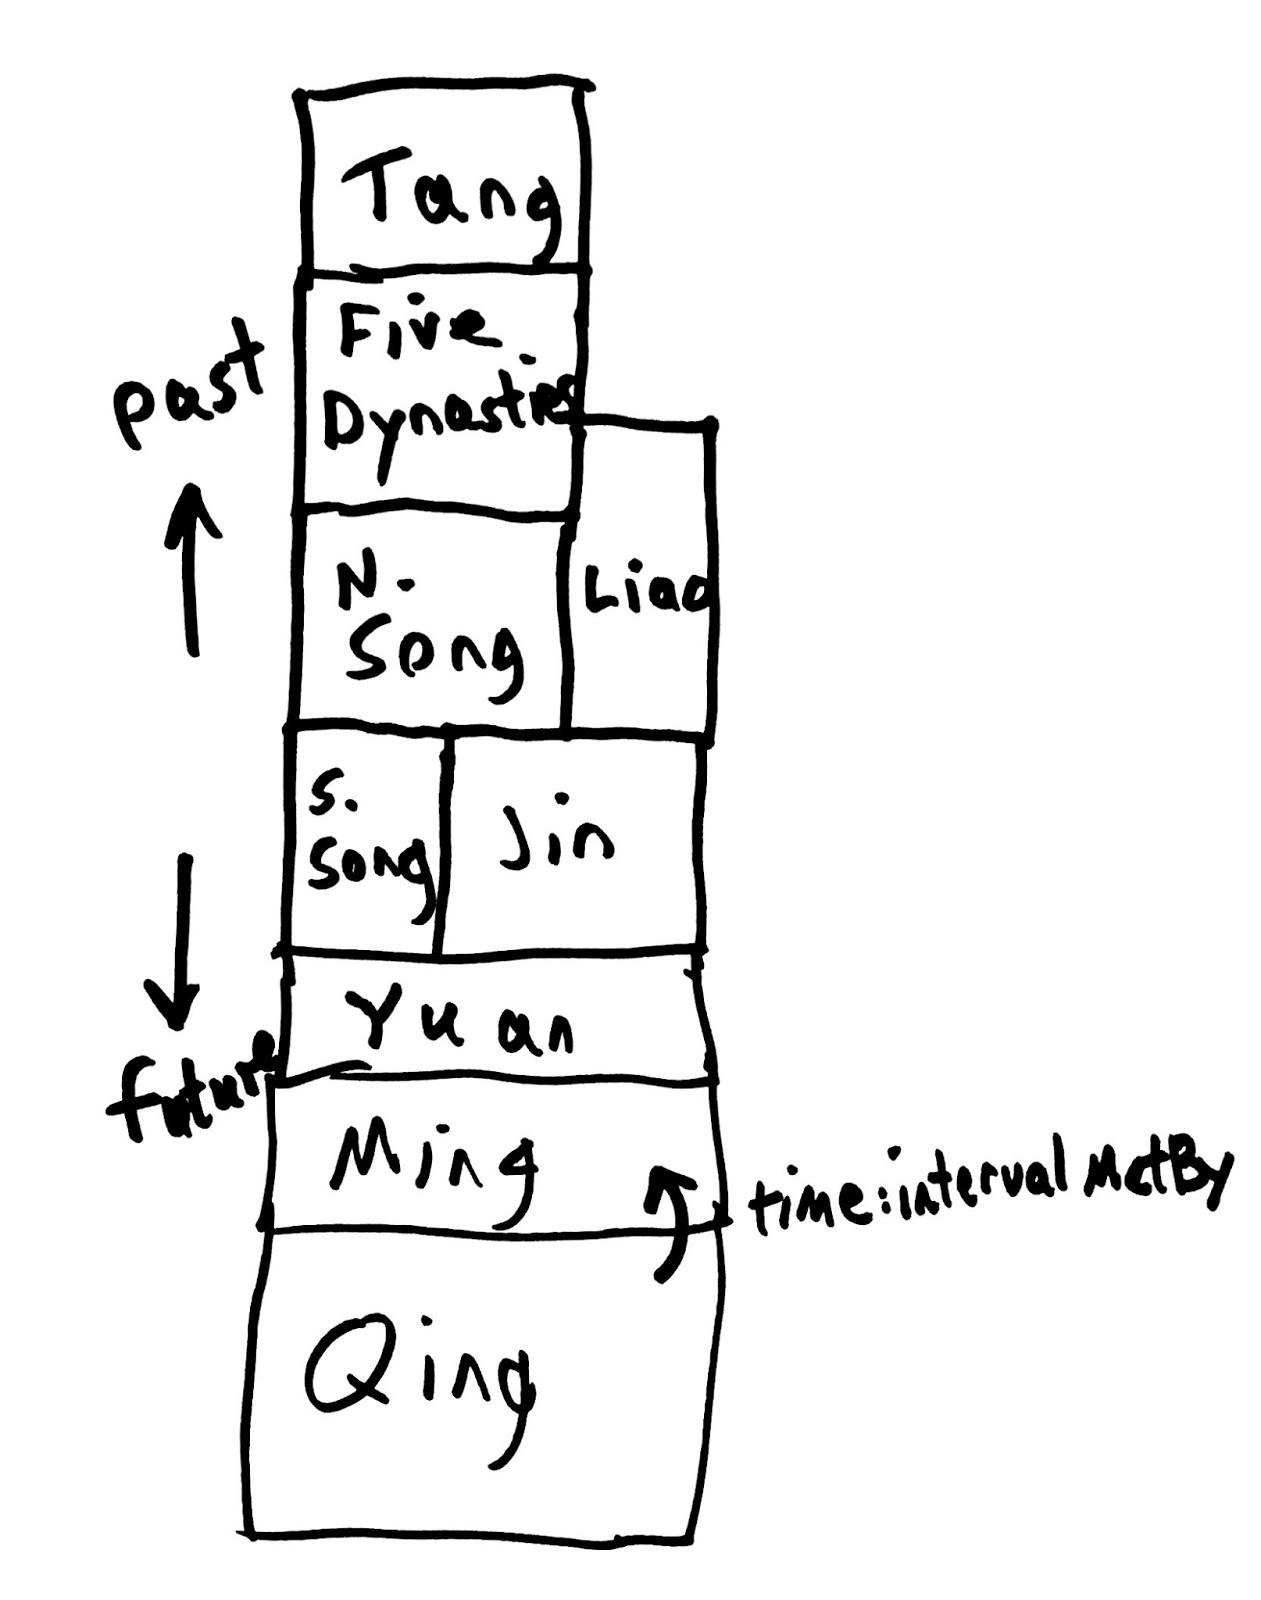 Steve Baskauf S Blog Sparql Based Web App To Find Chinese